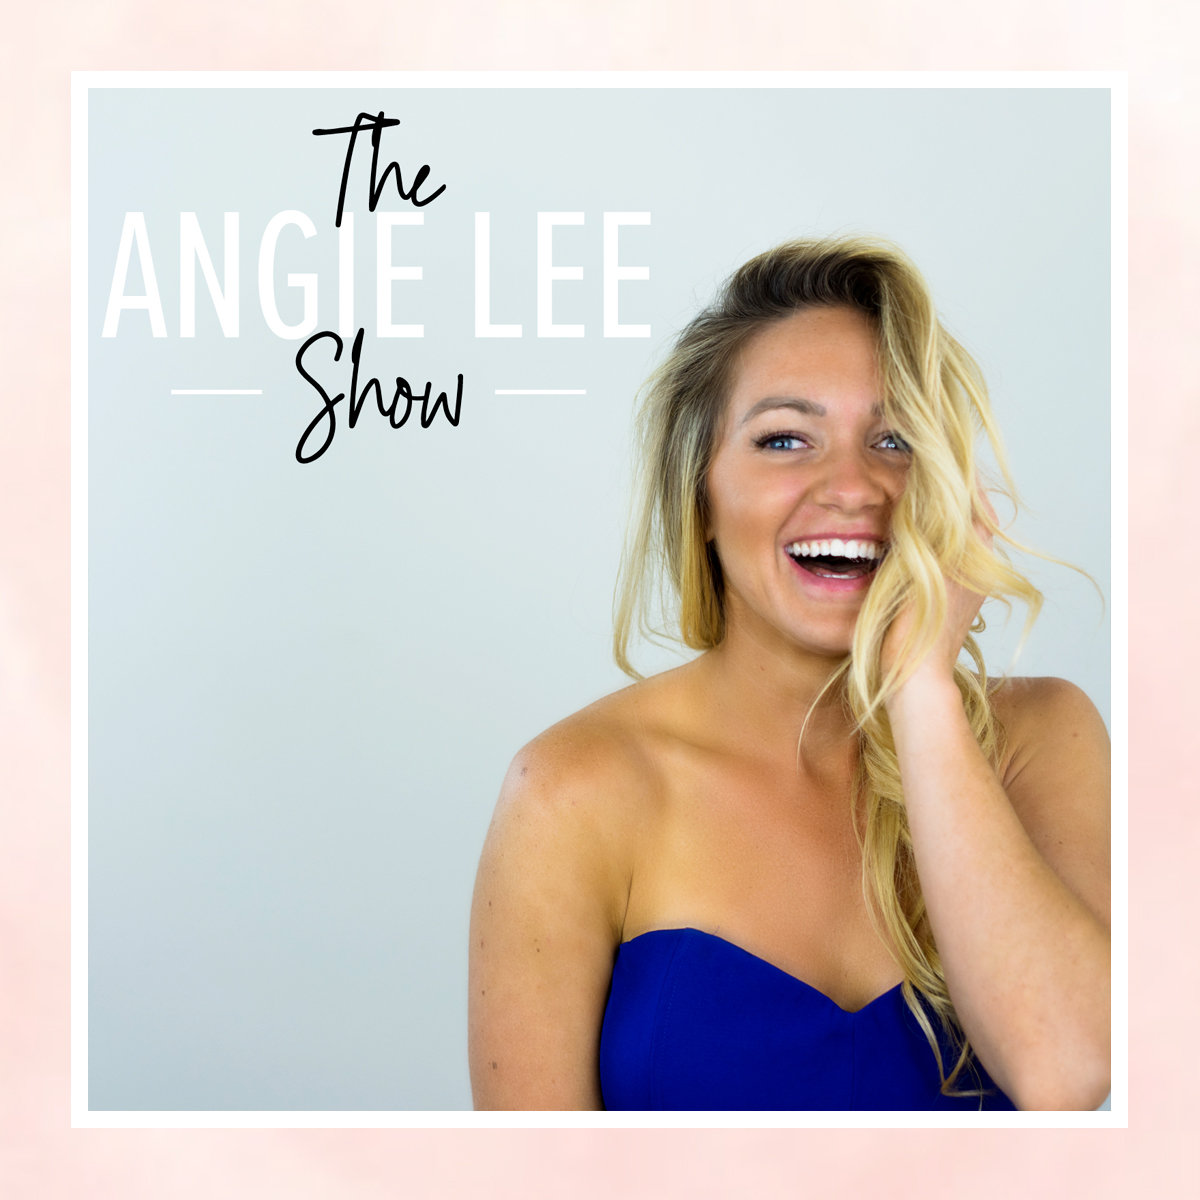 TheAngieLeeShow-EasilyInspired.jpg